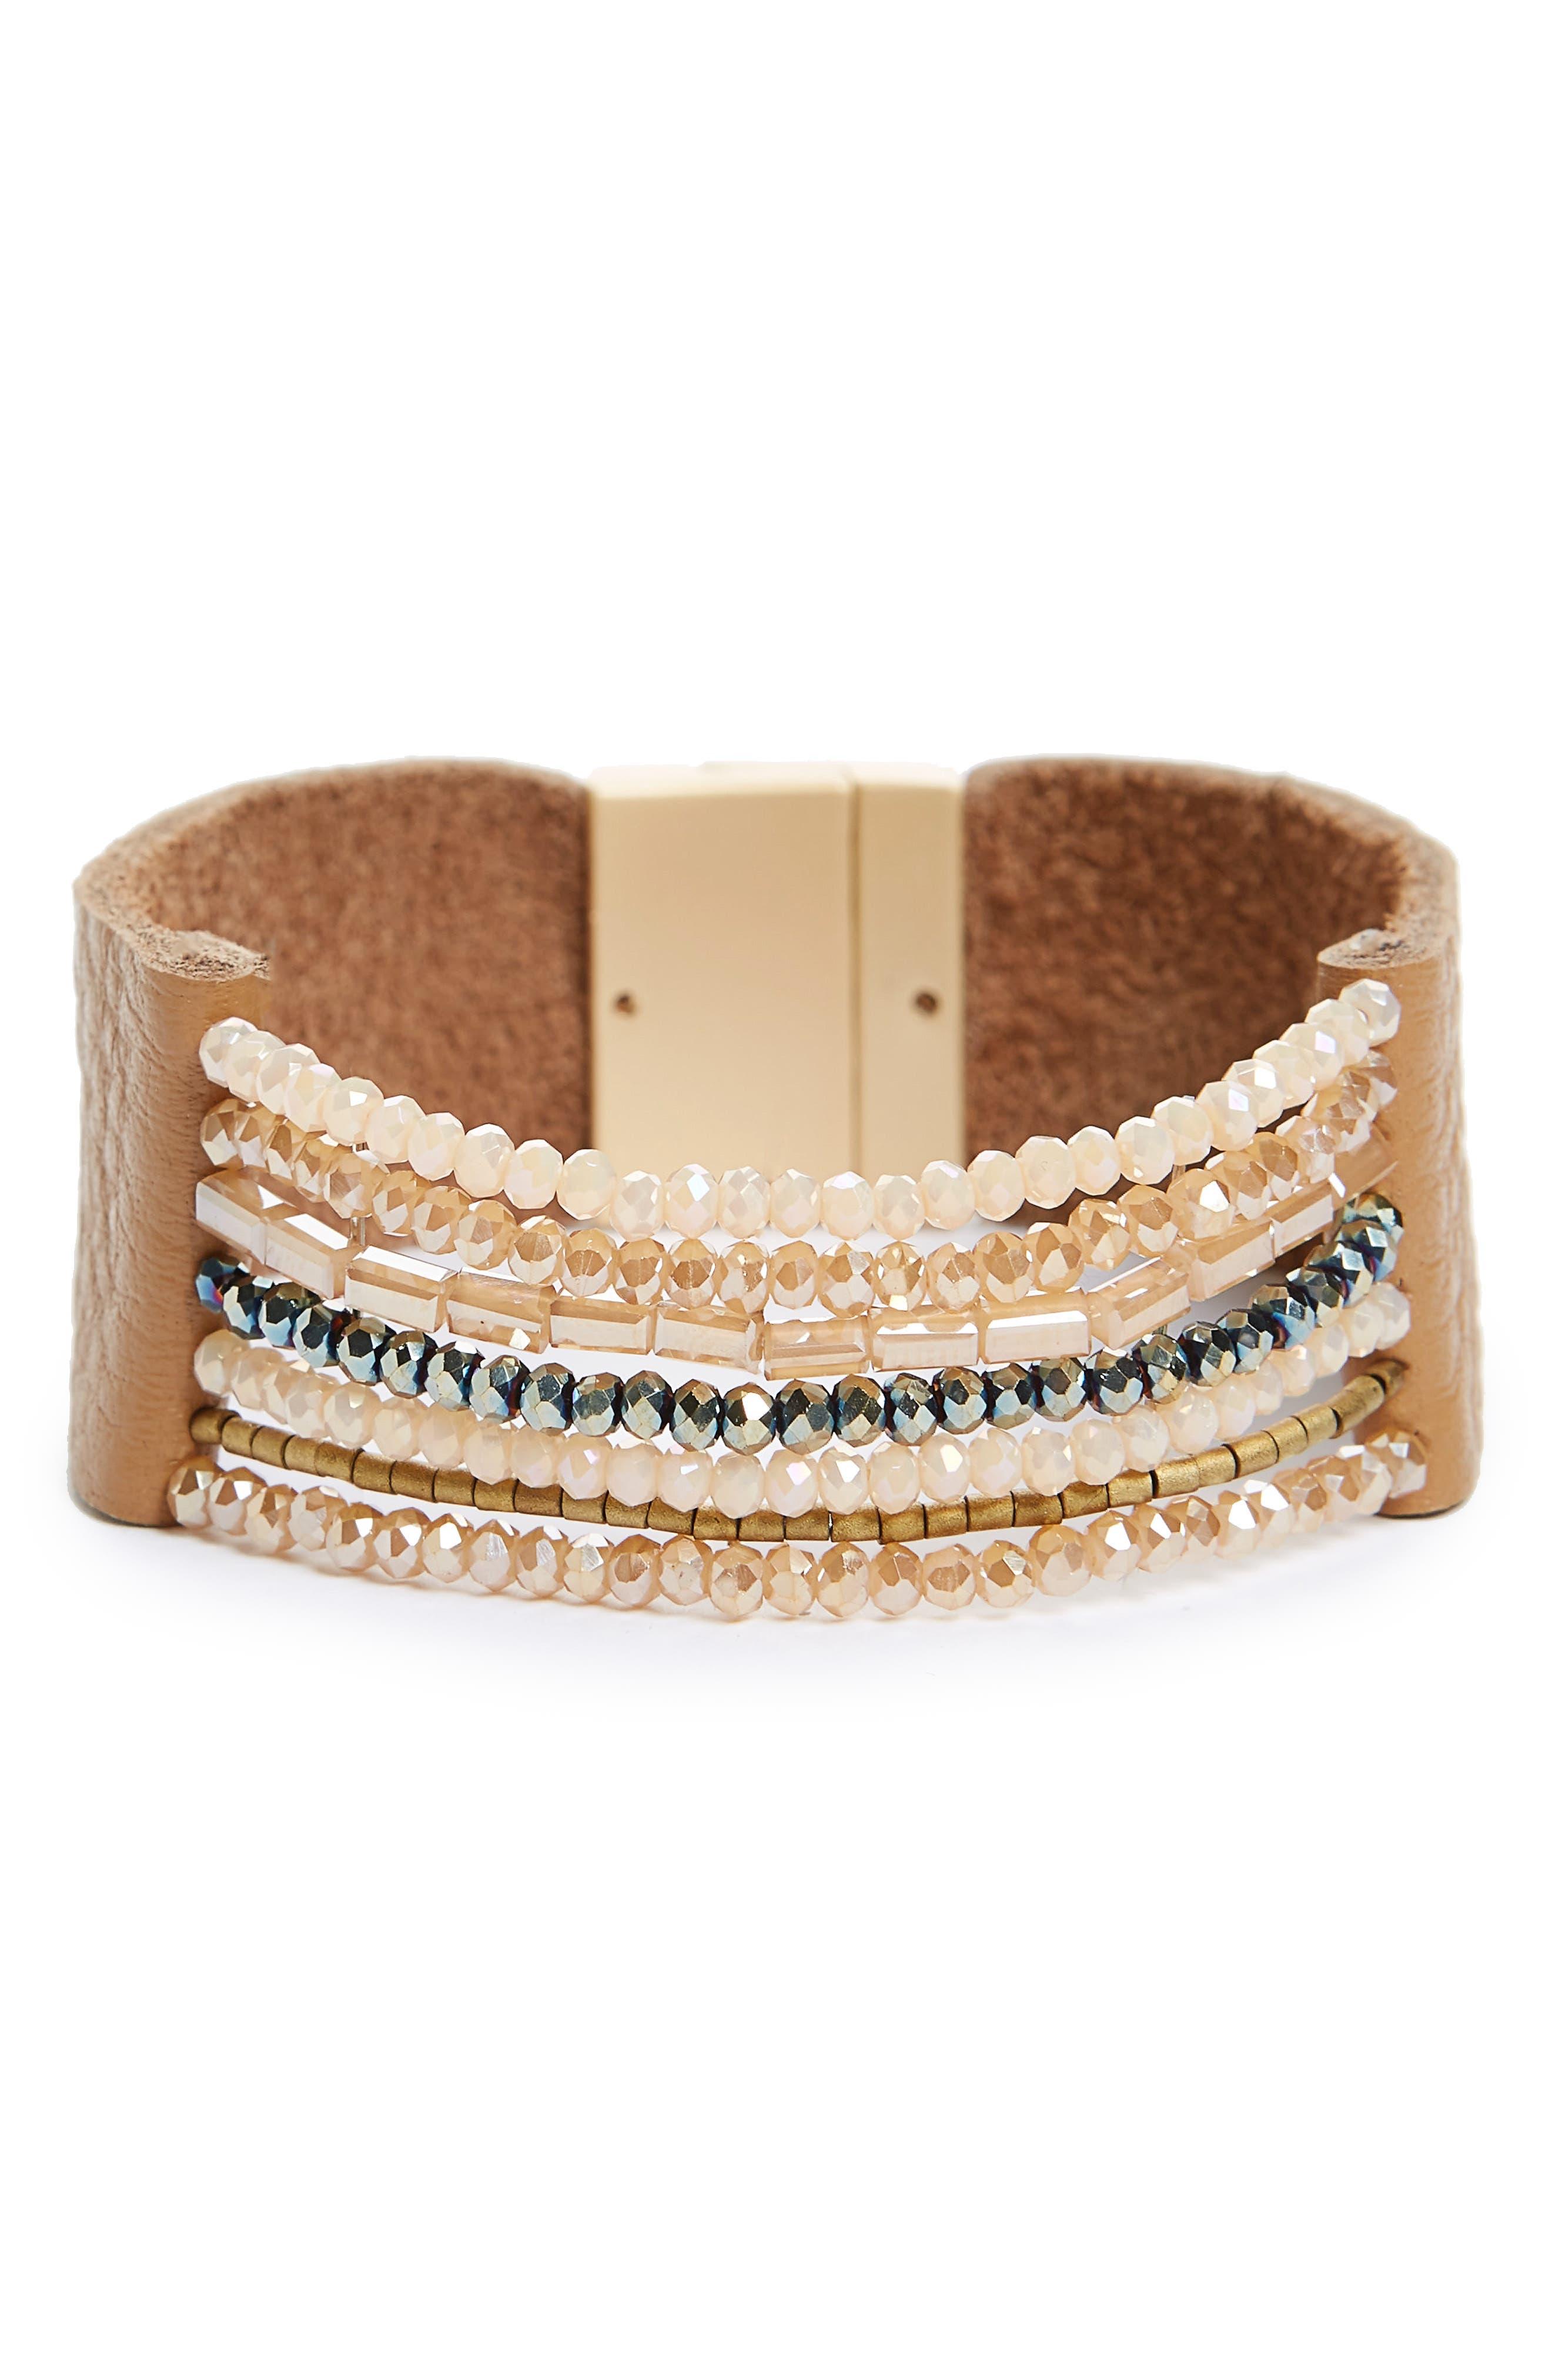 Beaded Leather Cuff Bracelet,                         Main,                         color, 200